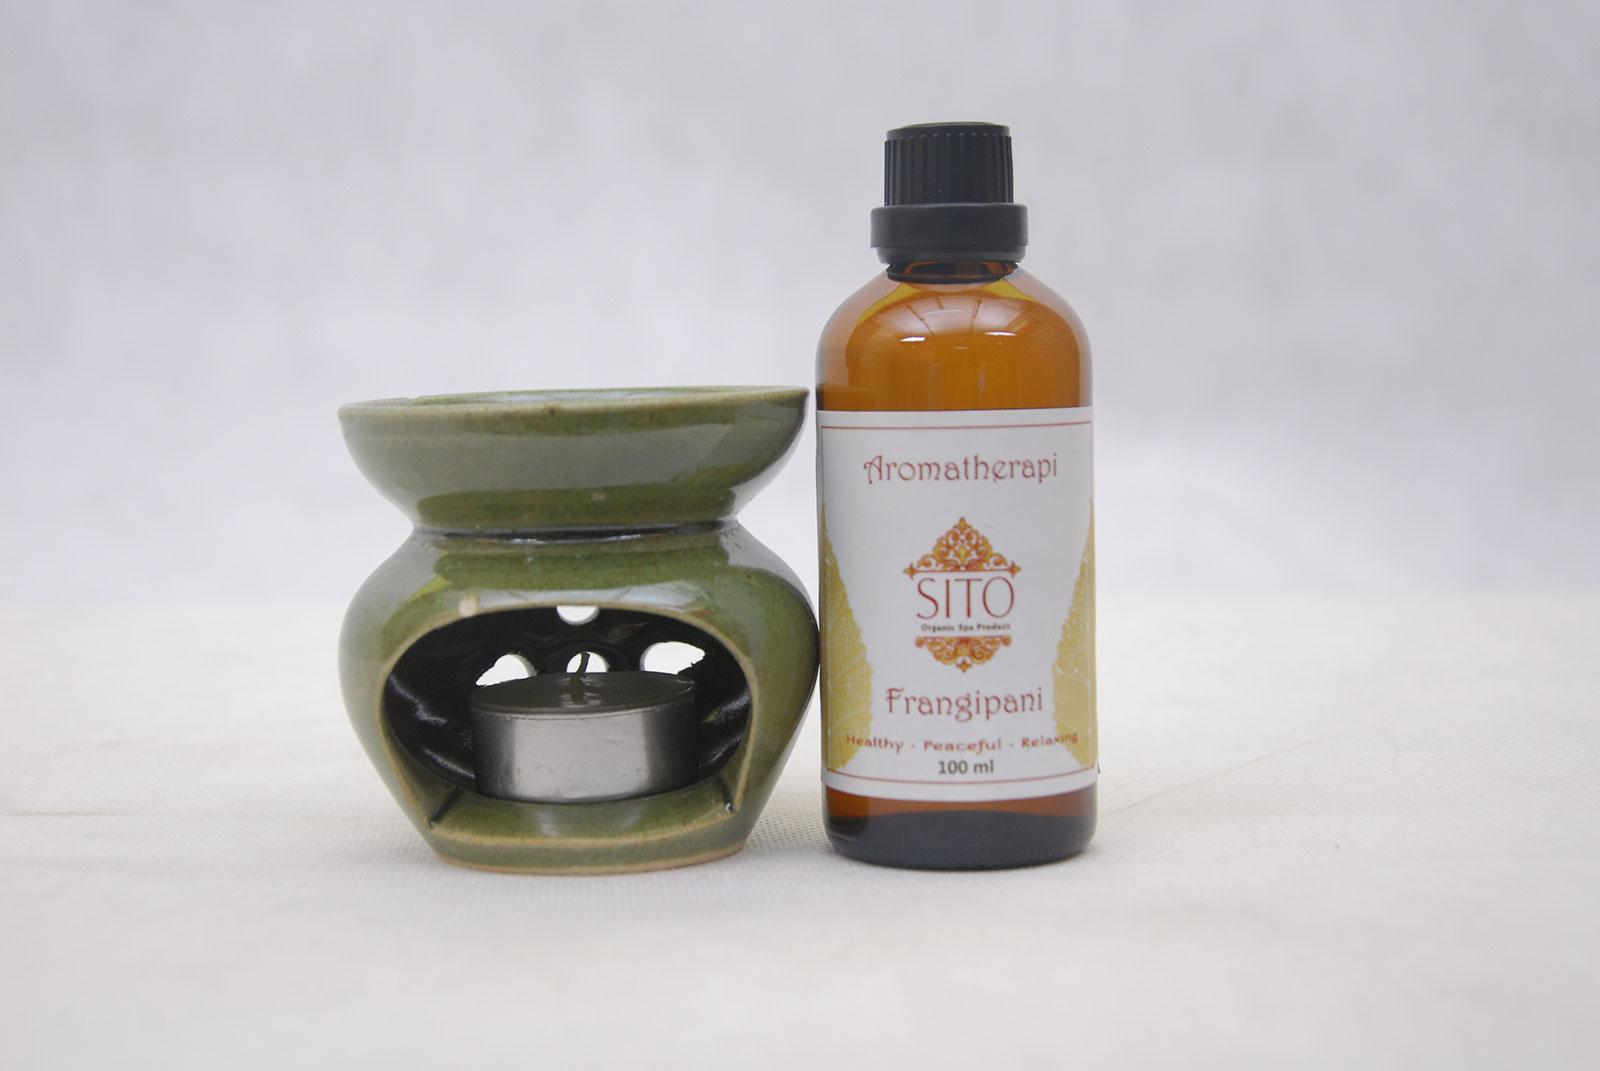 Aromatherapi Frangipani